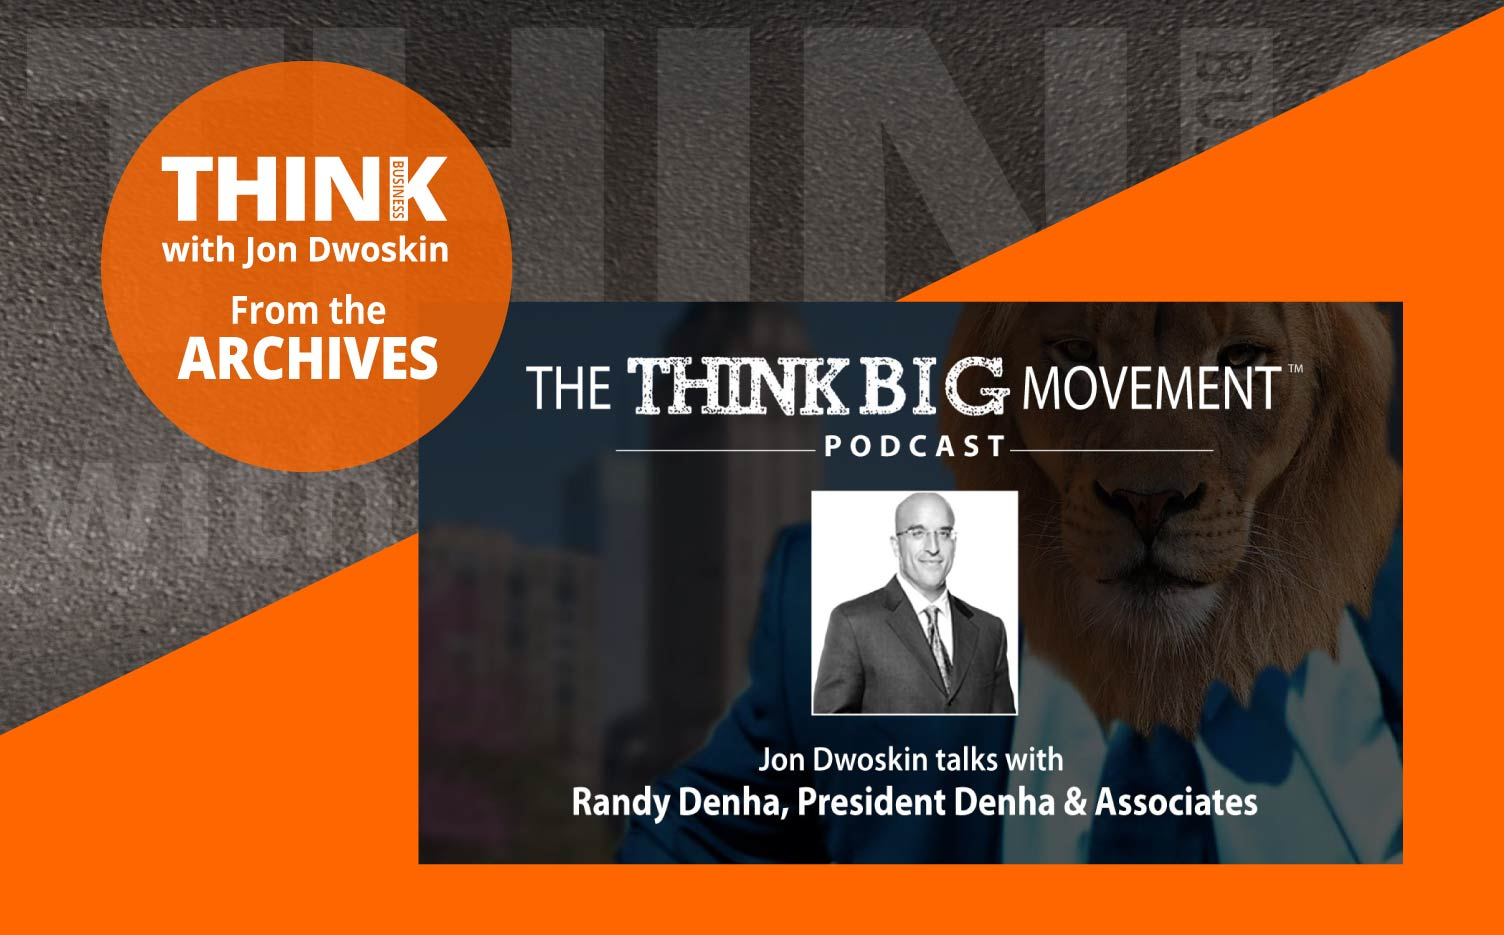 THINK Business Podcast: Jon Dwoskin Interviews Randall Denha, President of Denha & Associates